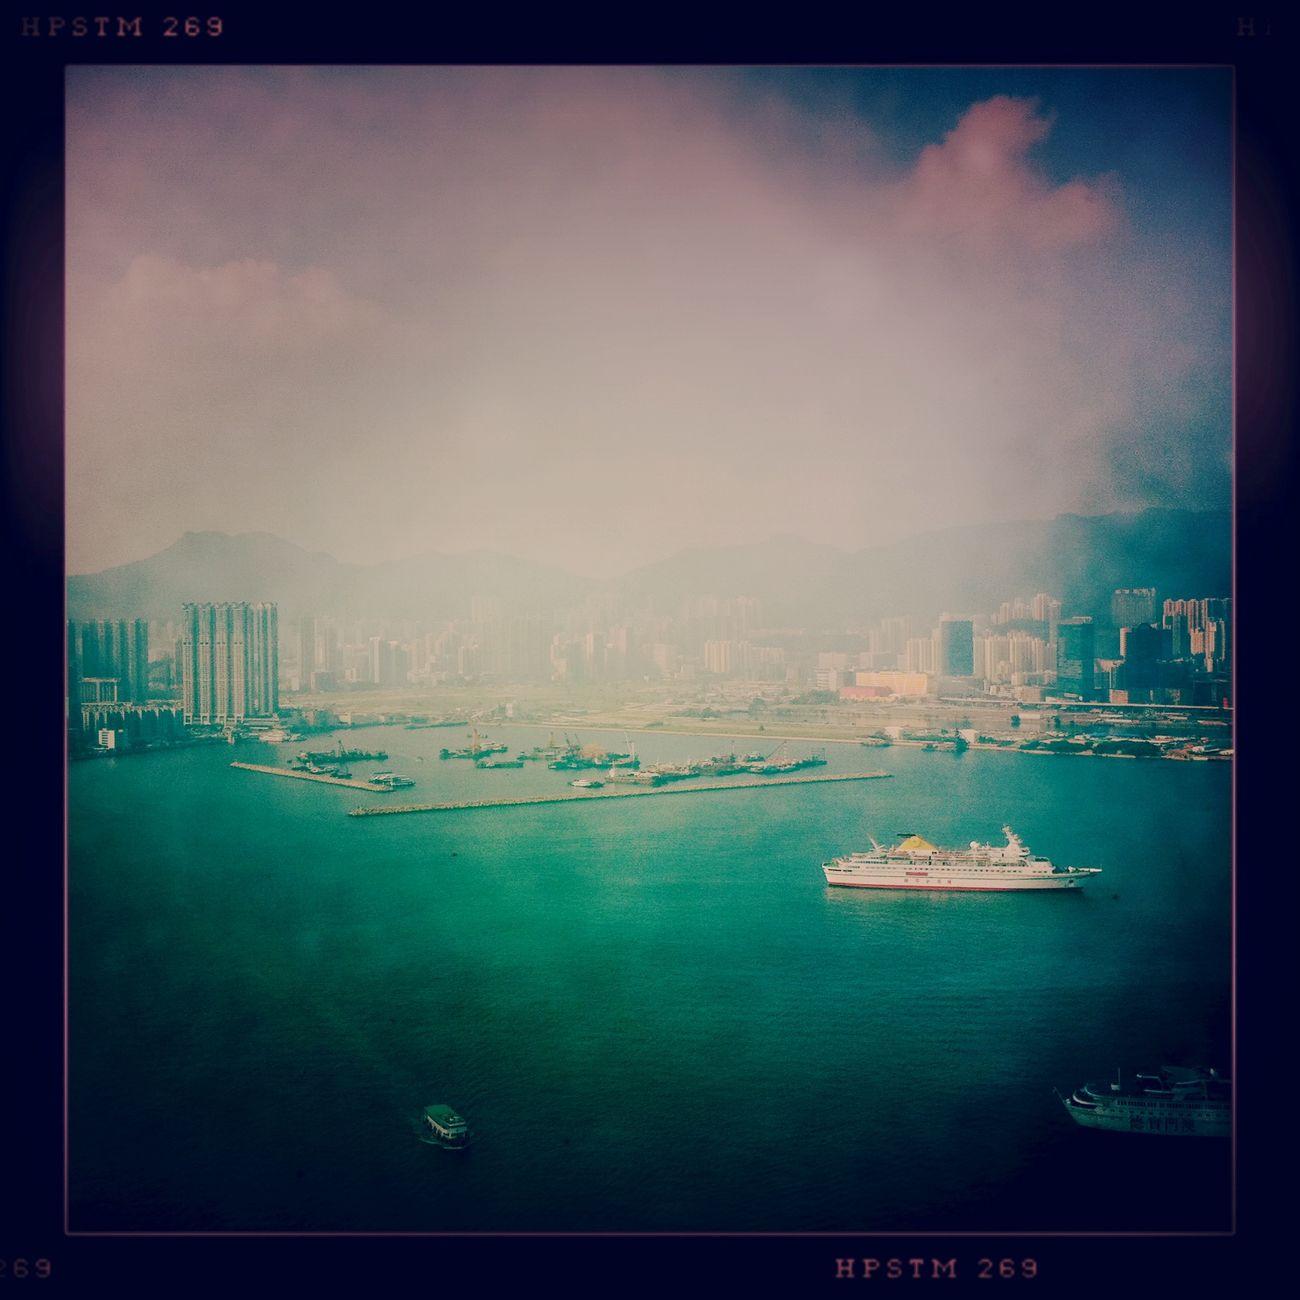 Boarding at Hung Hom Ferry Pier 紅磡渡輪碼頭 No Flash Pistil Film Boarding